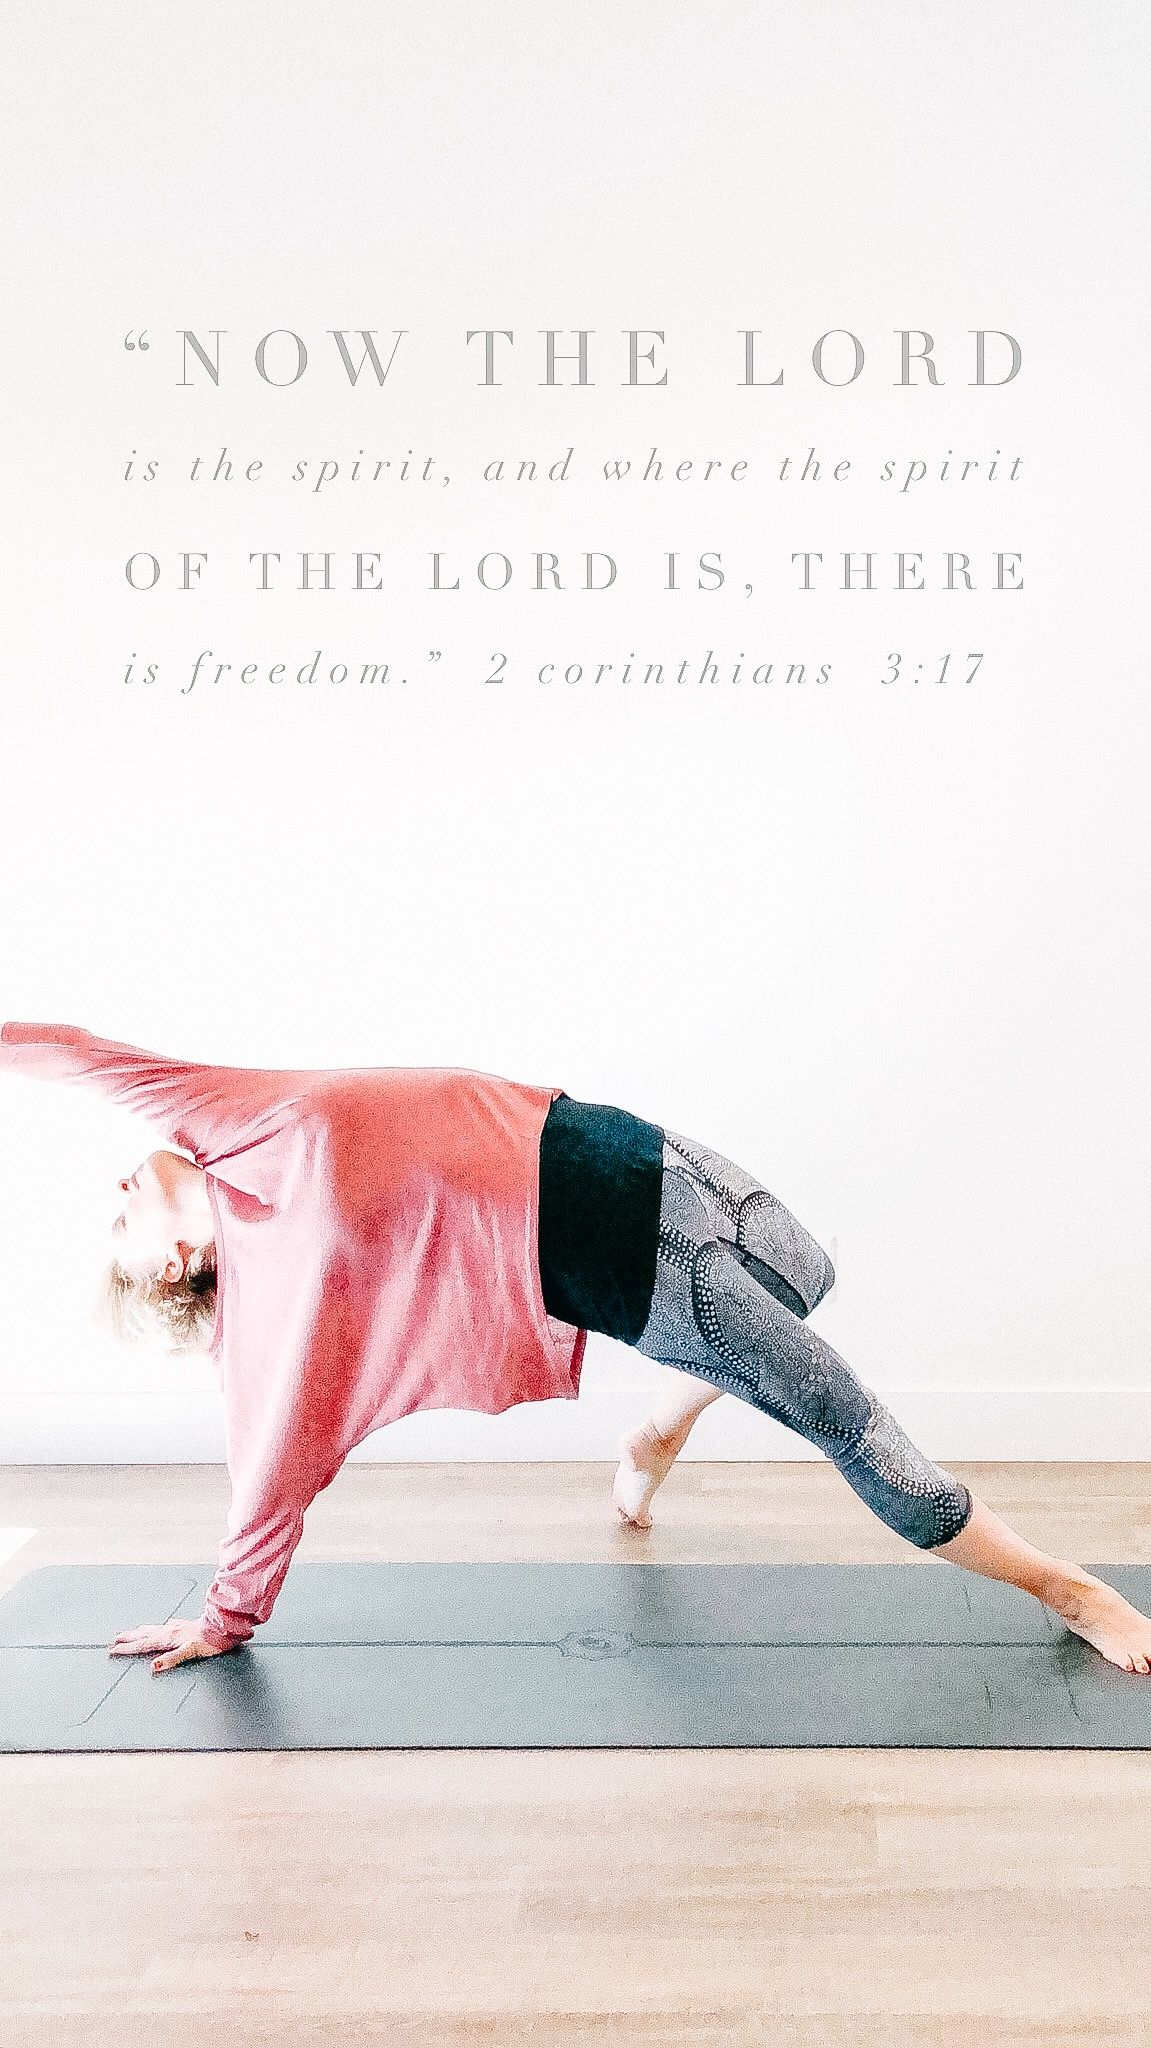 Freedom 2 Corinthians 2 Corinthians 3 17 2 Corinthians 3